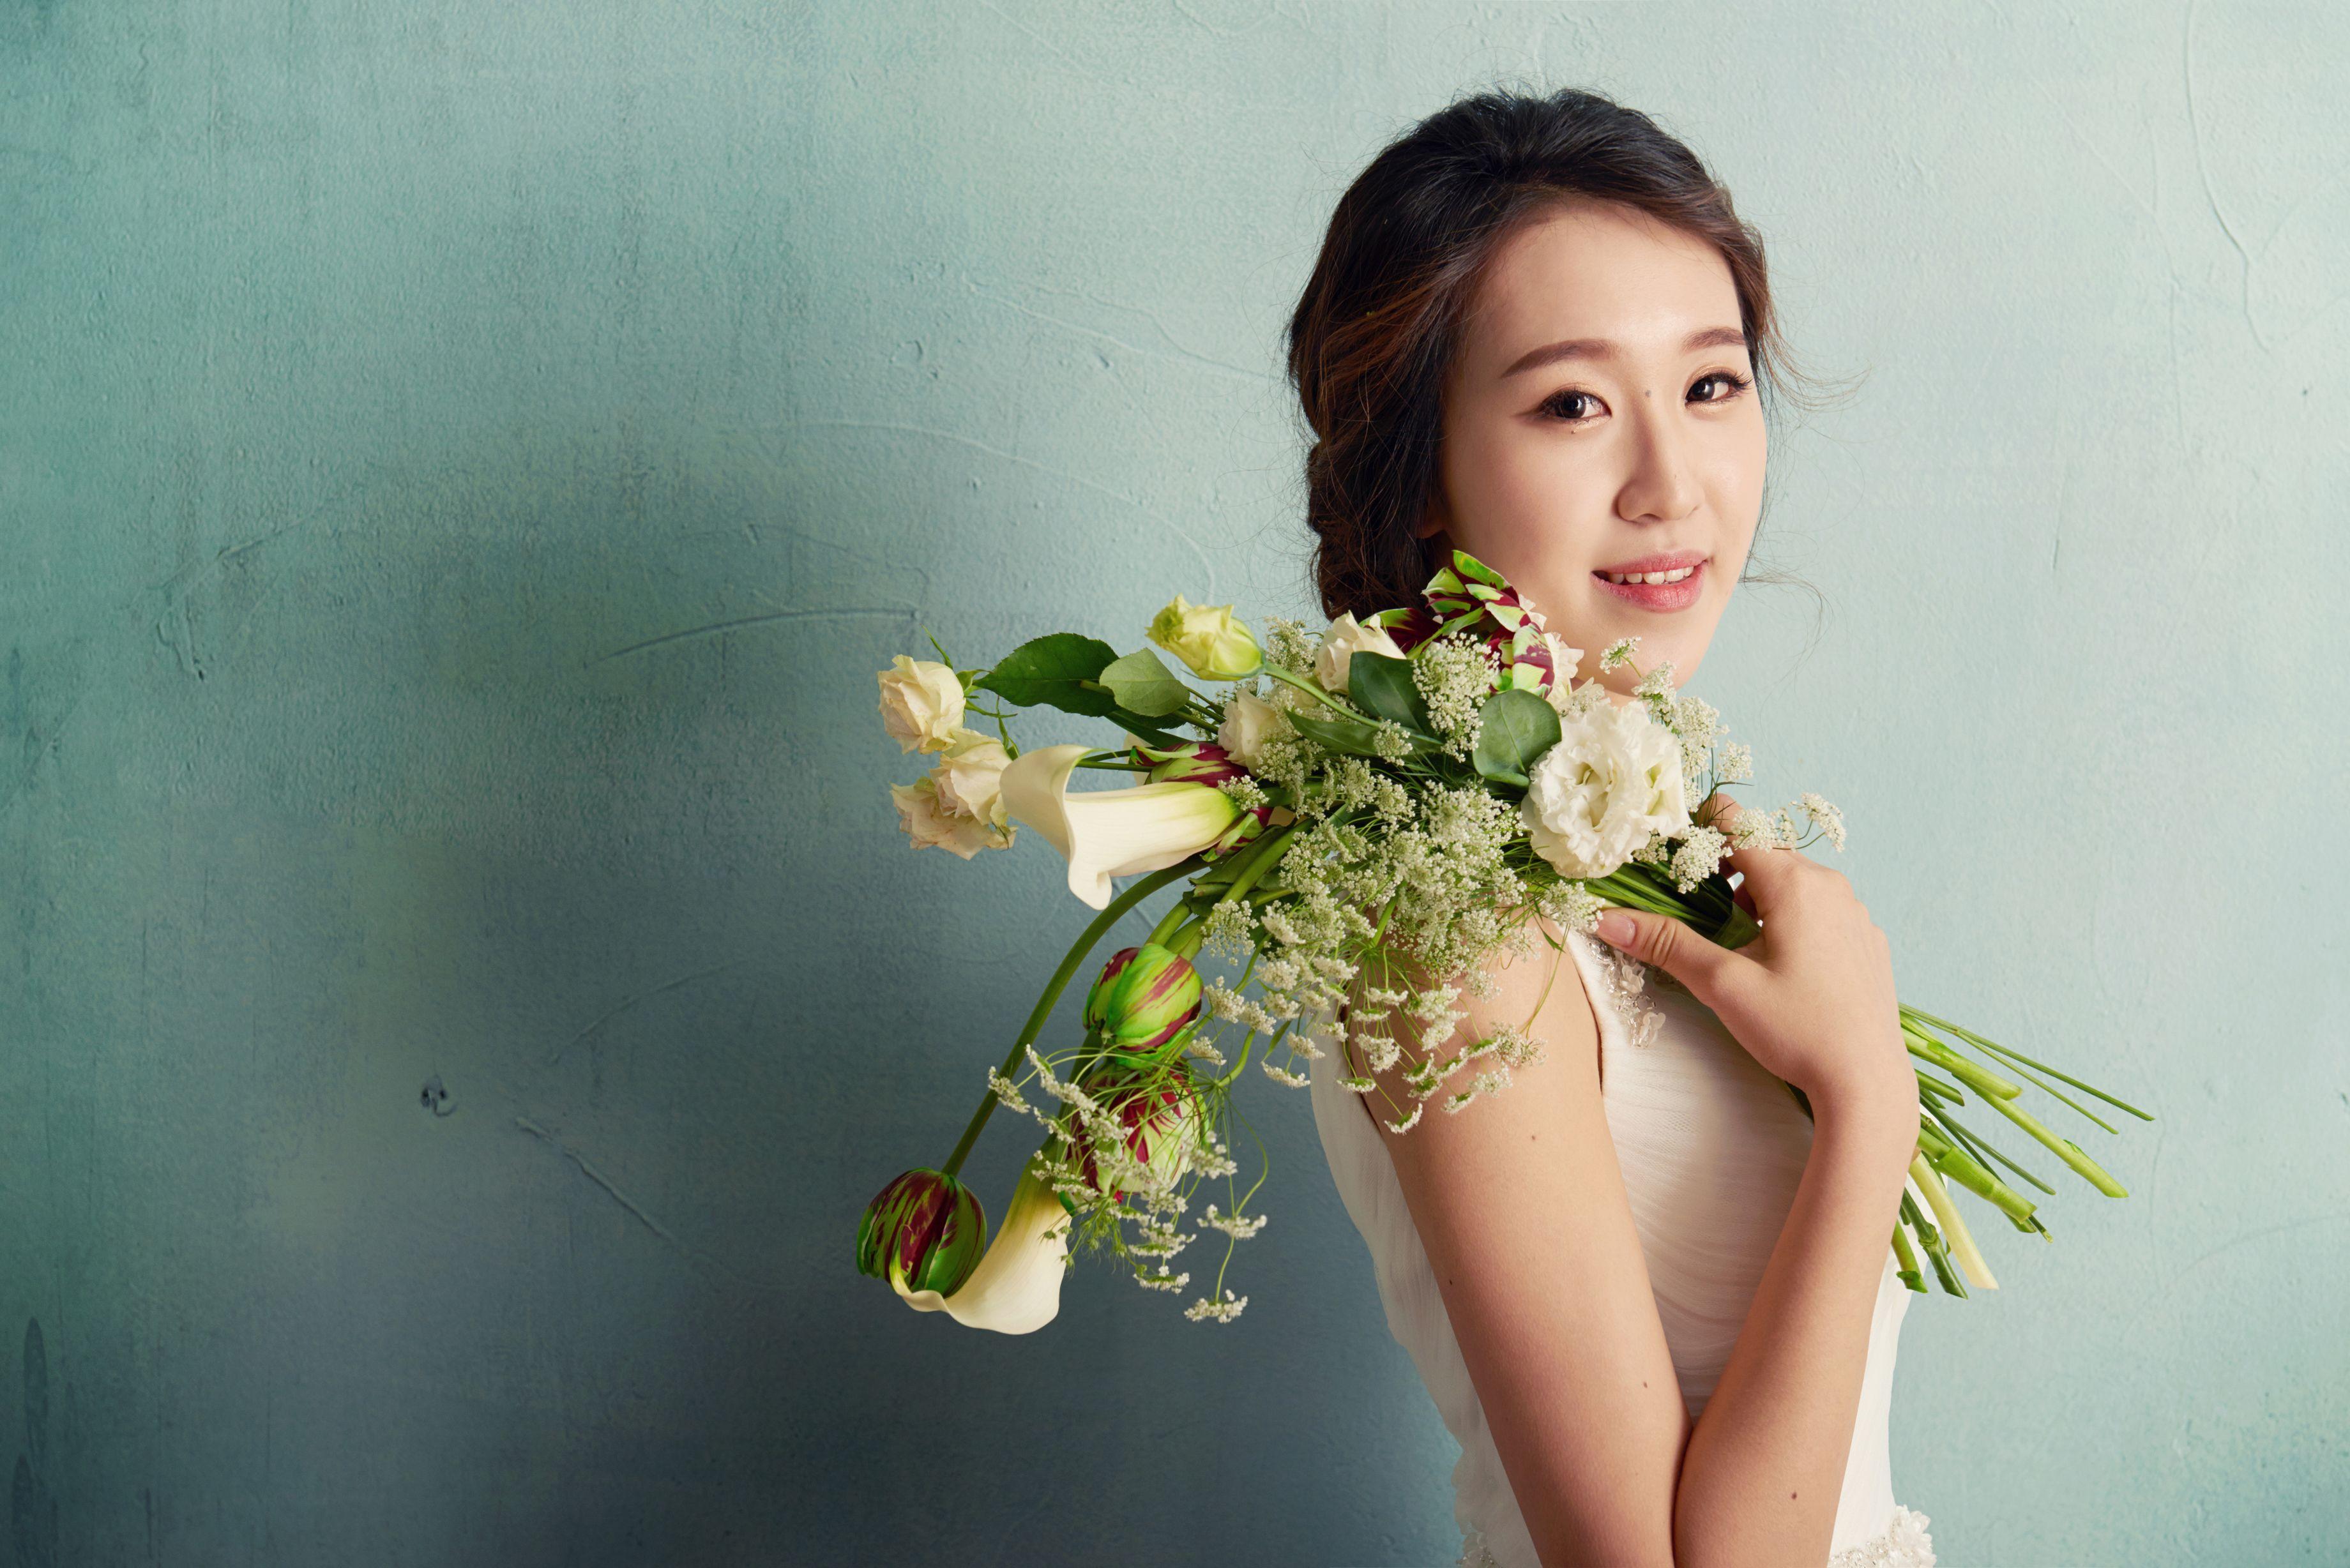 Wedding21 4월호 독자모델 화보.